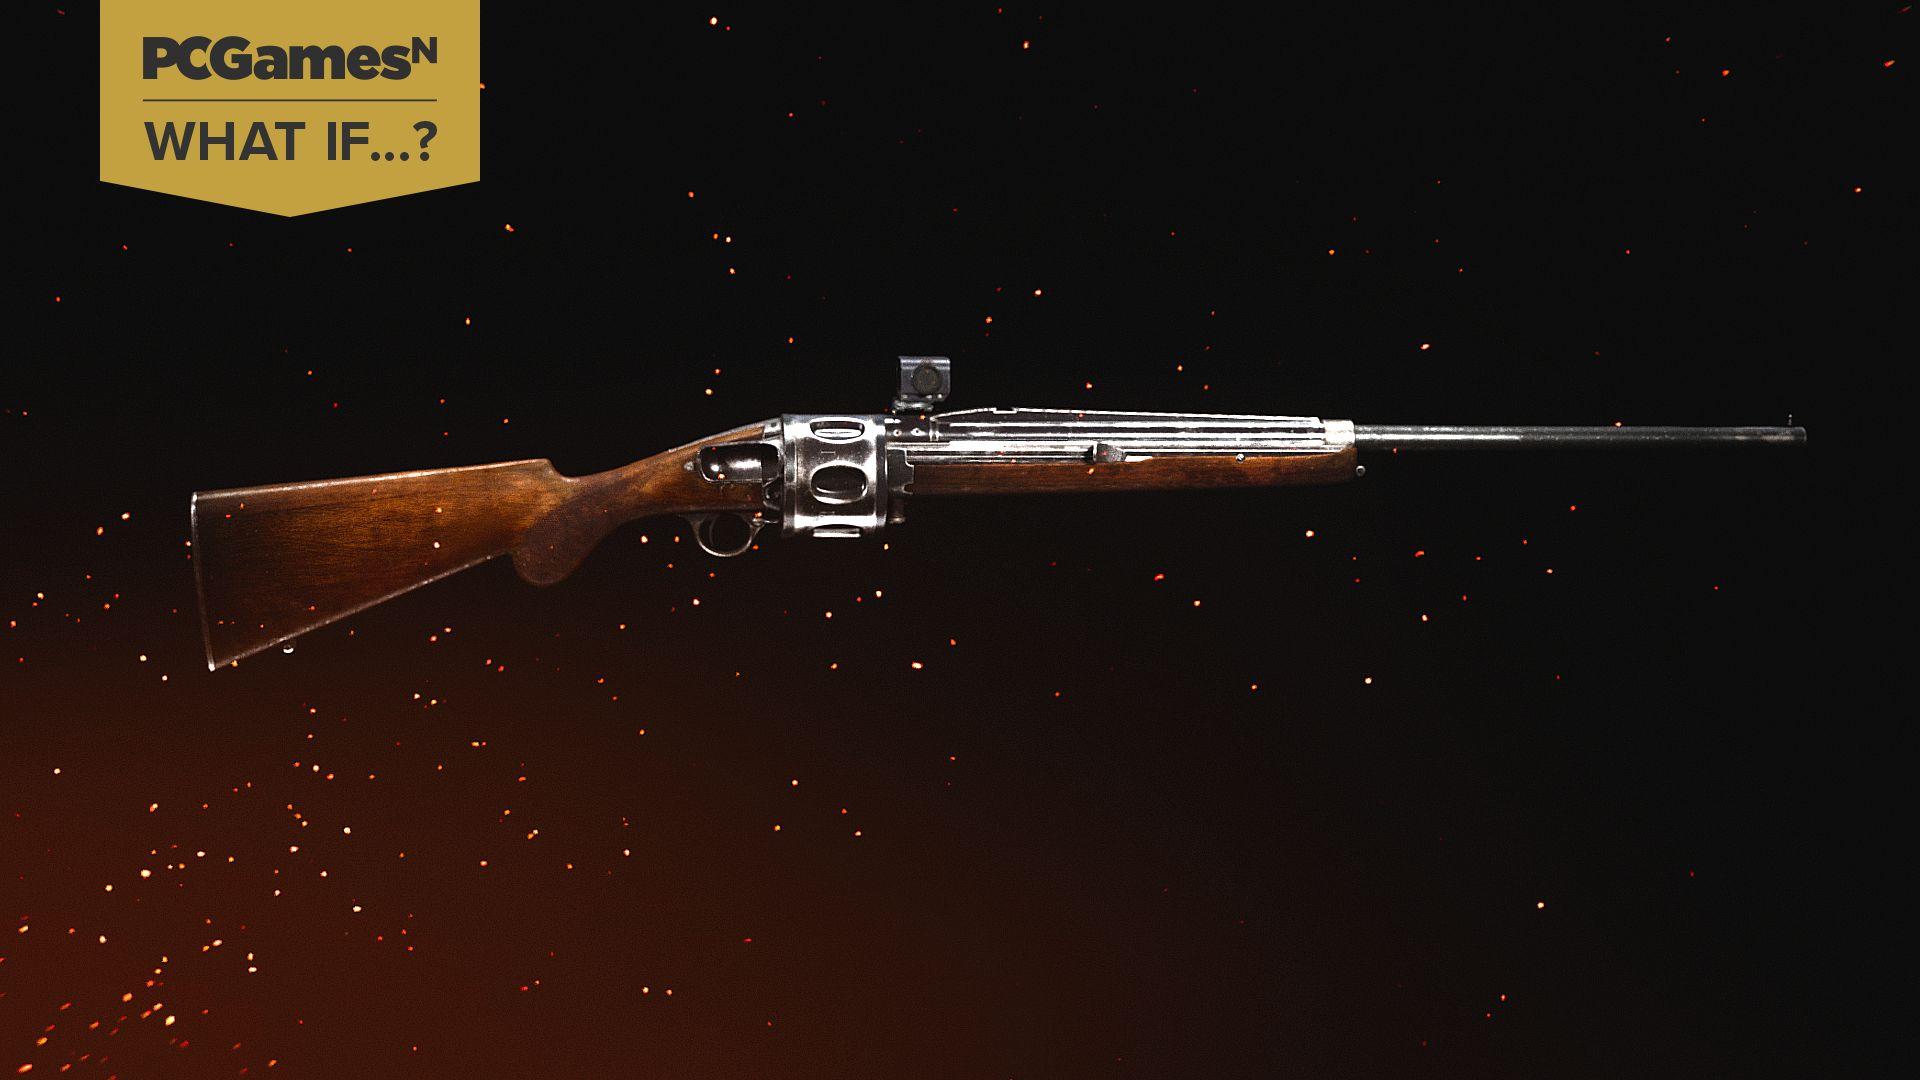 What if: Call of Duty: Vanguard's shotguns didn't suck?